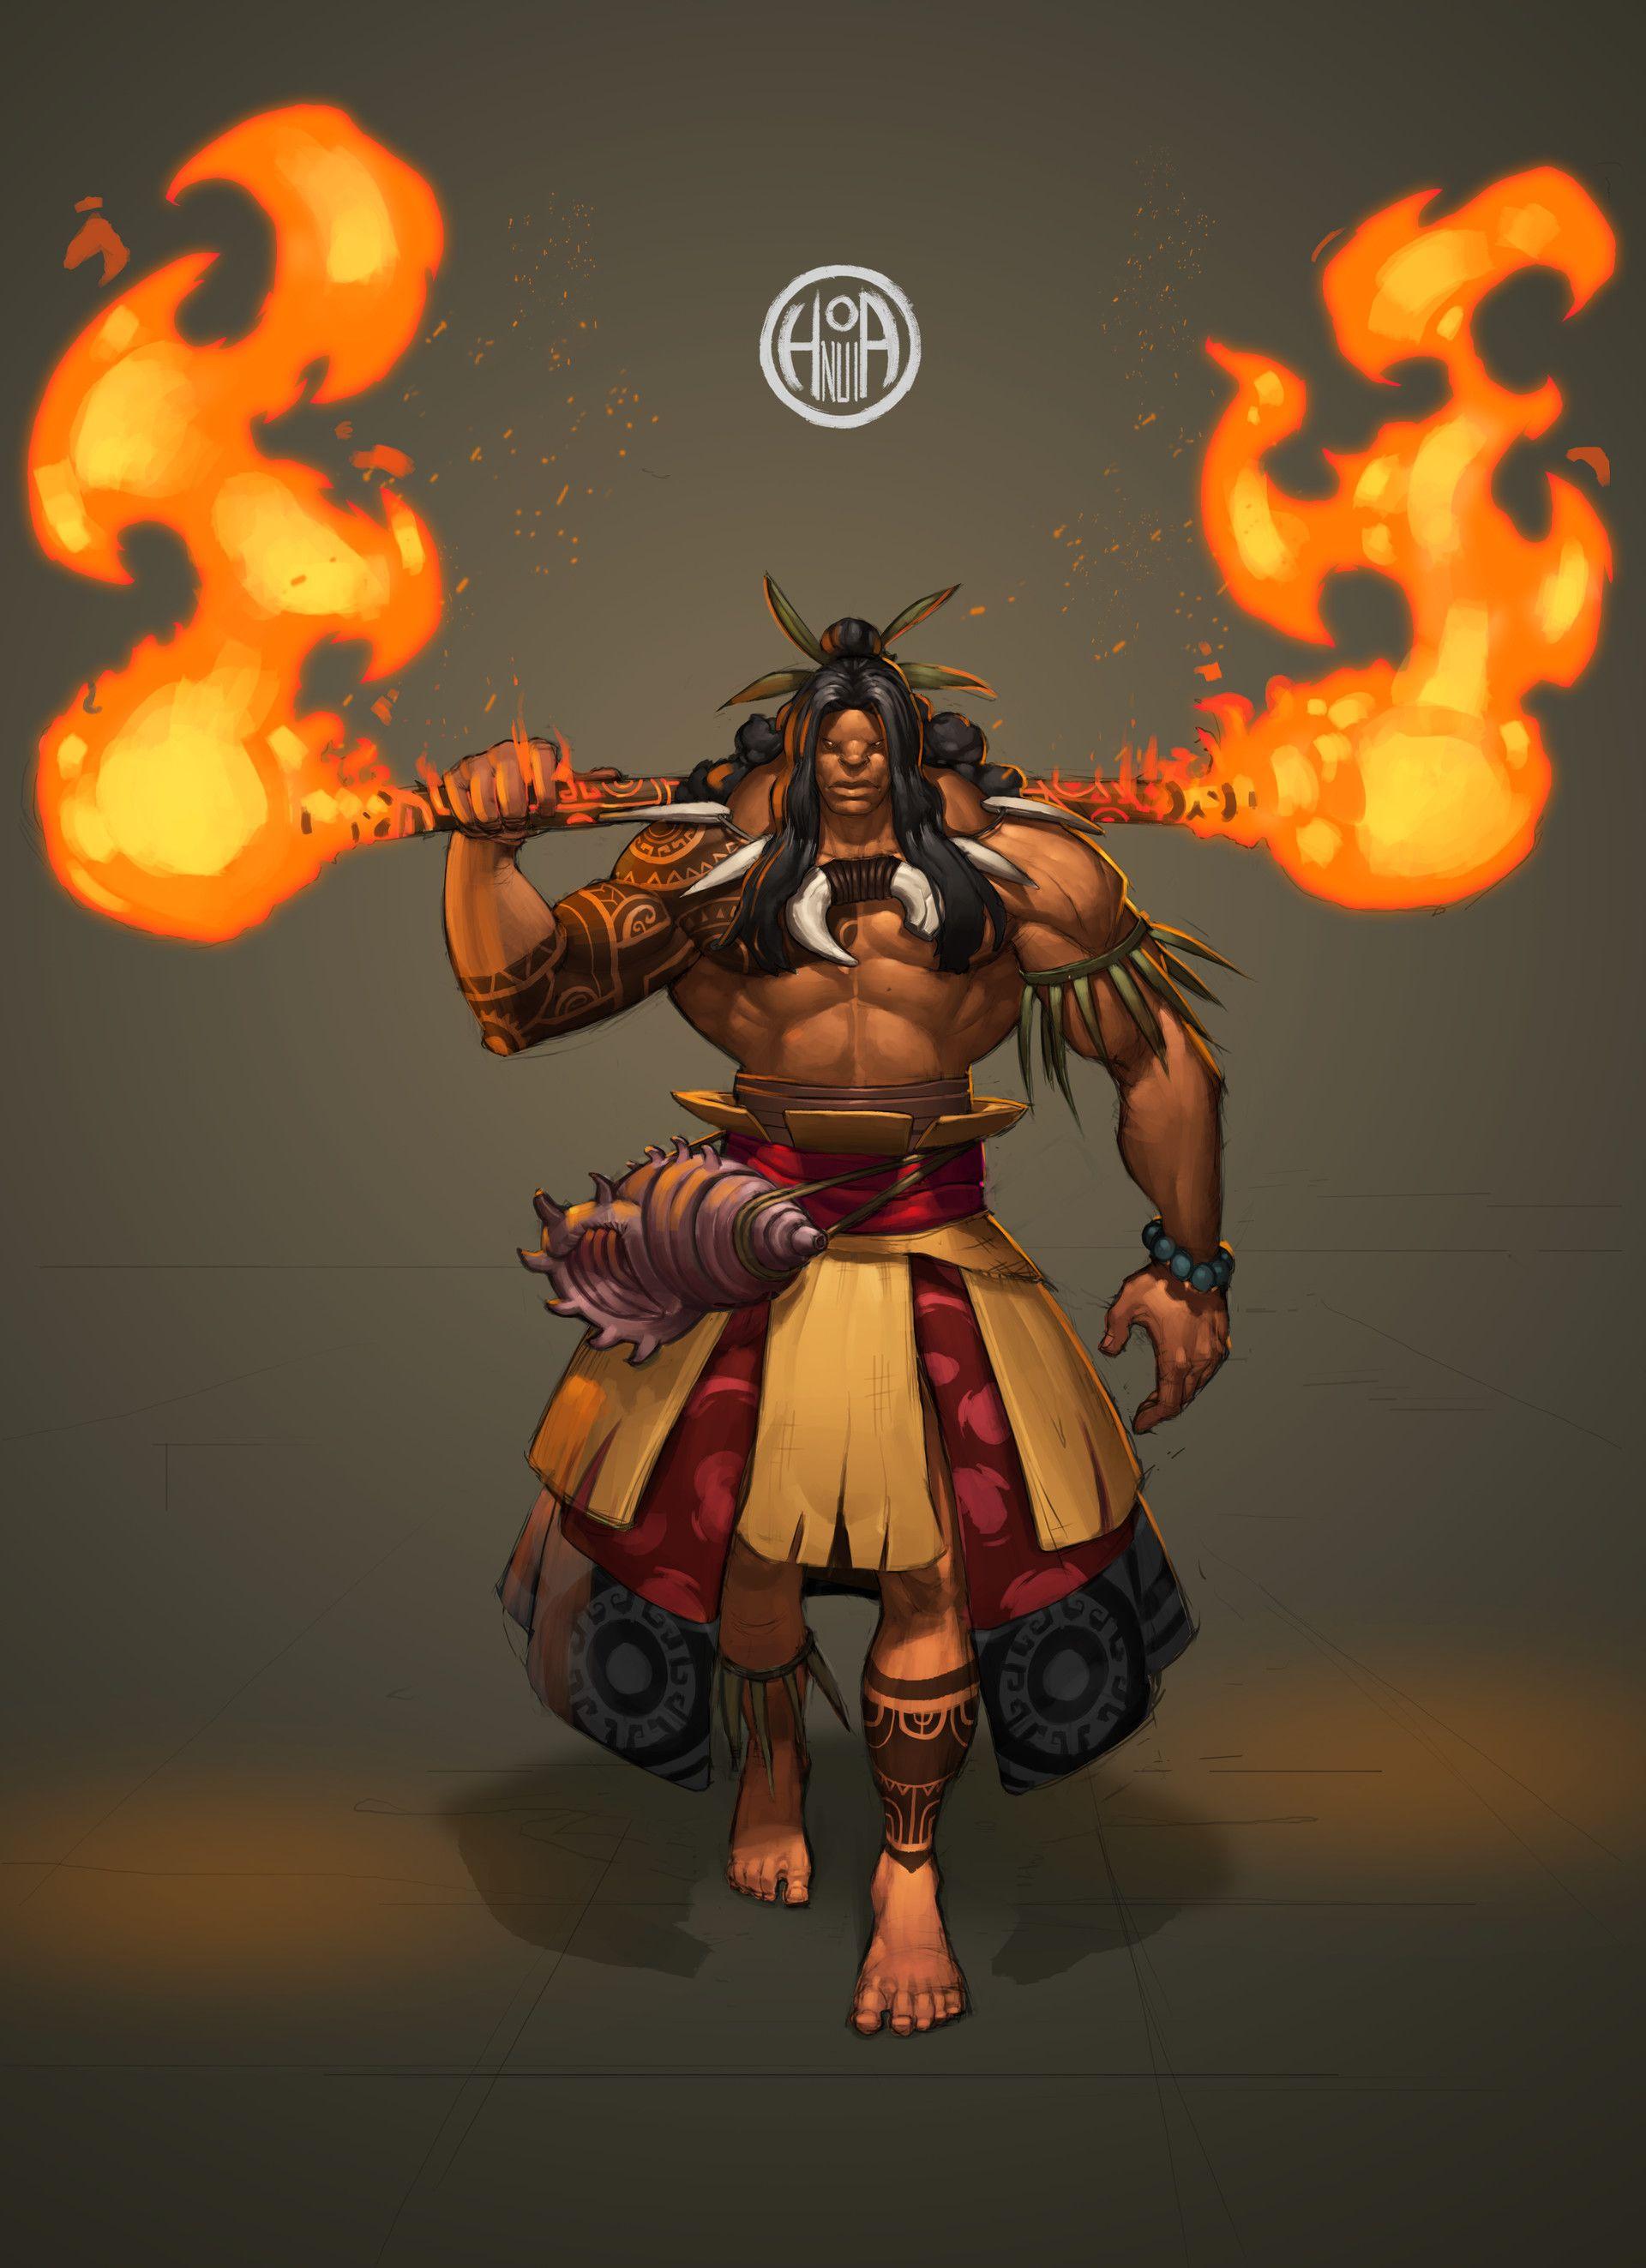 Various Maori Krieger Reference Of Artstation - Cdc (maori Warrior) - Oro,